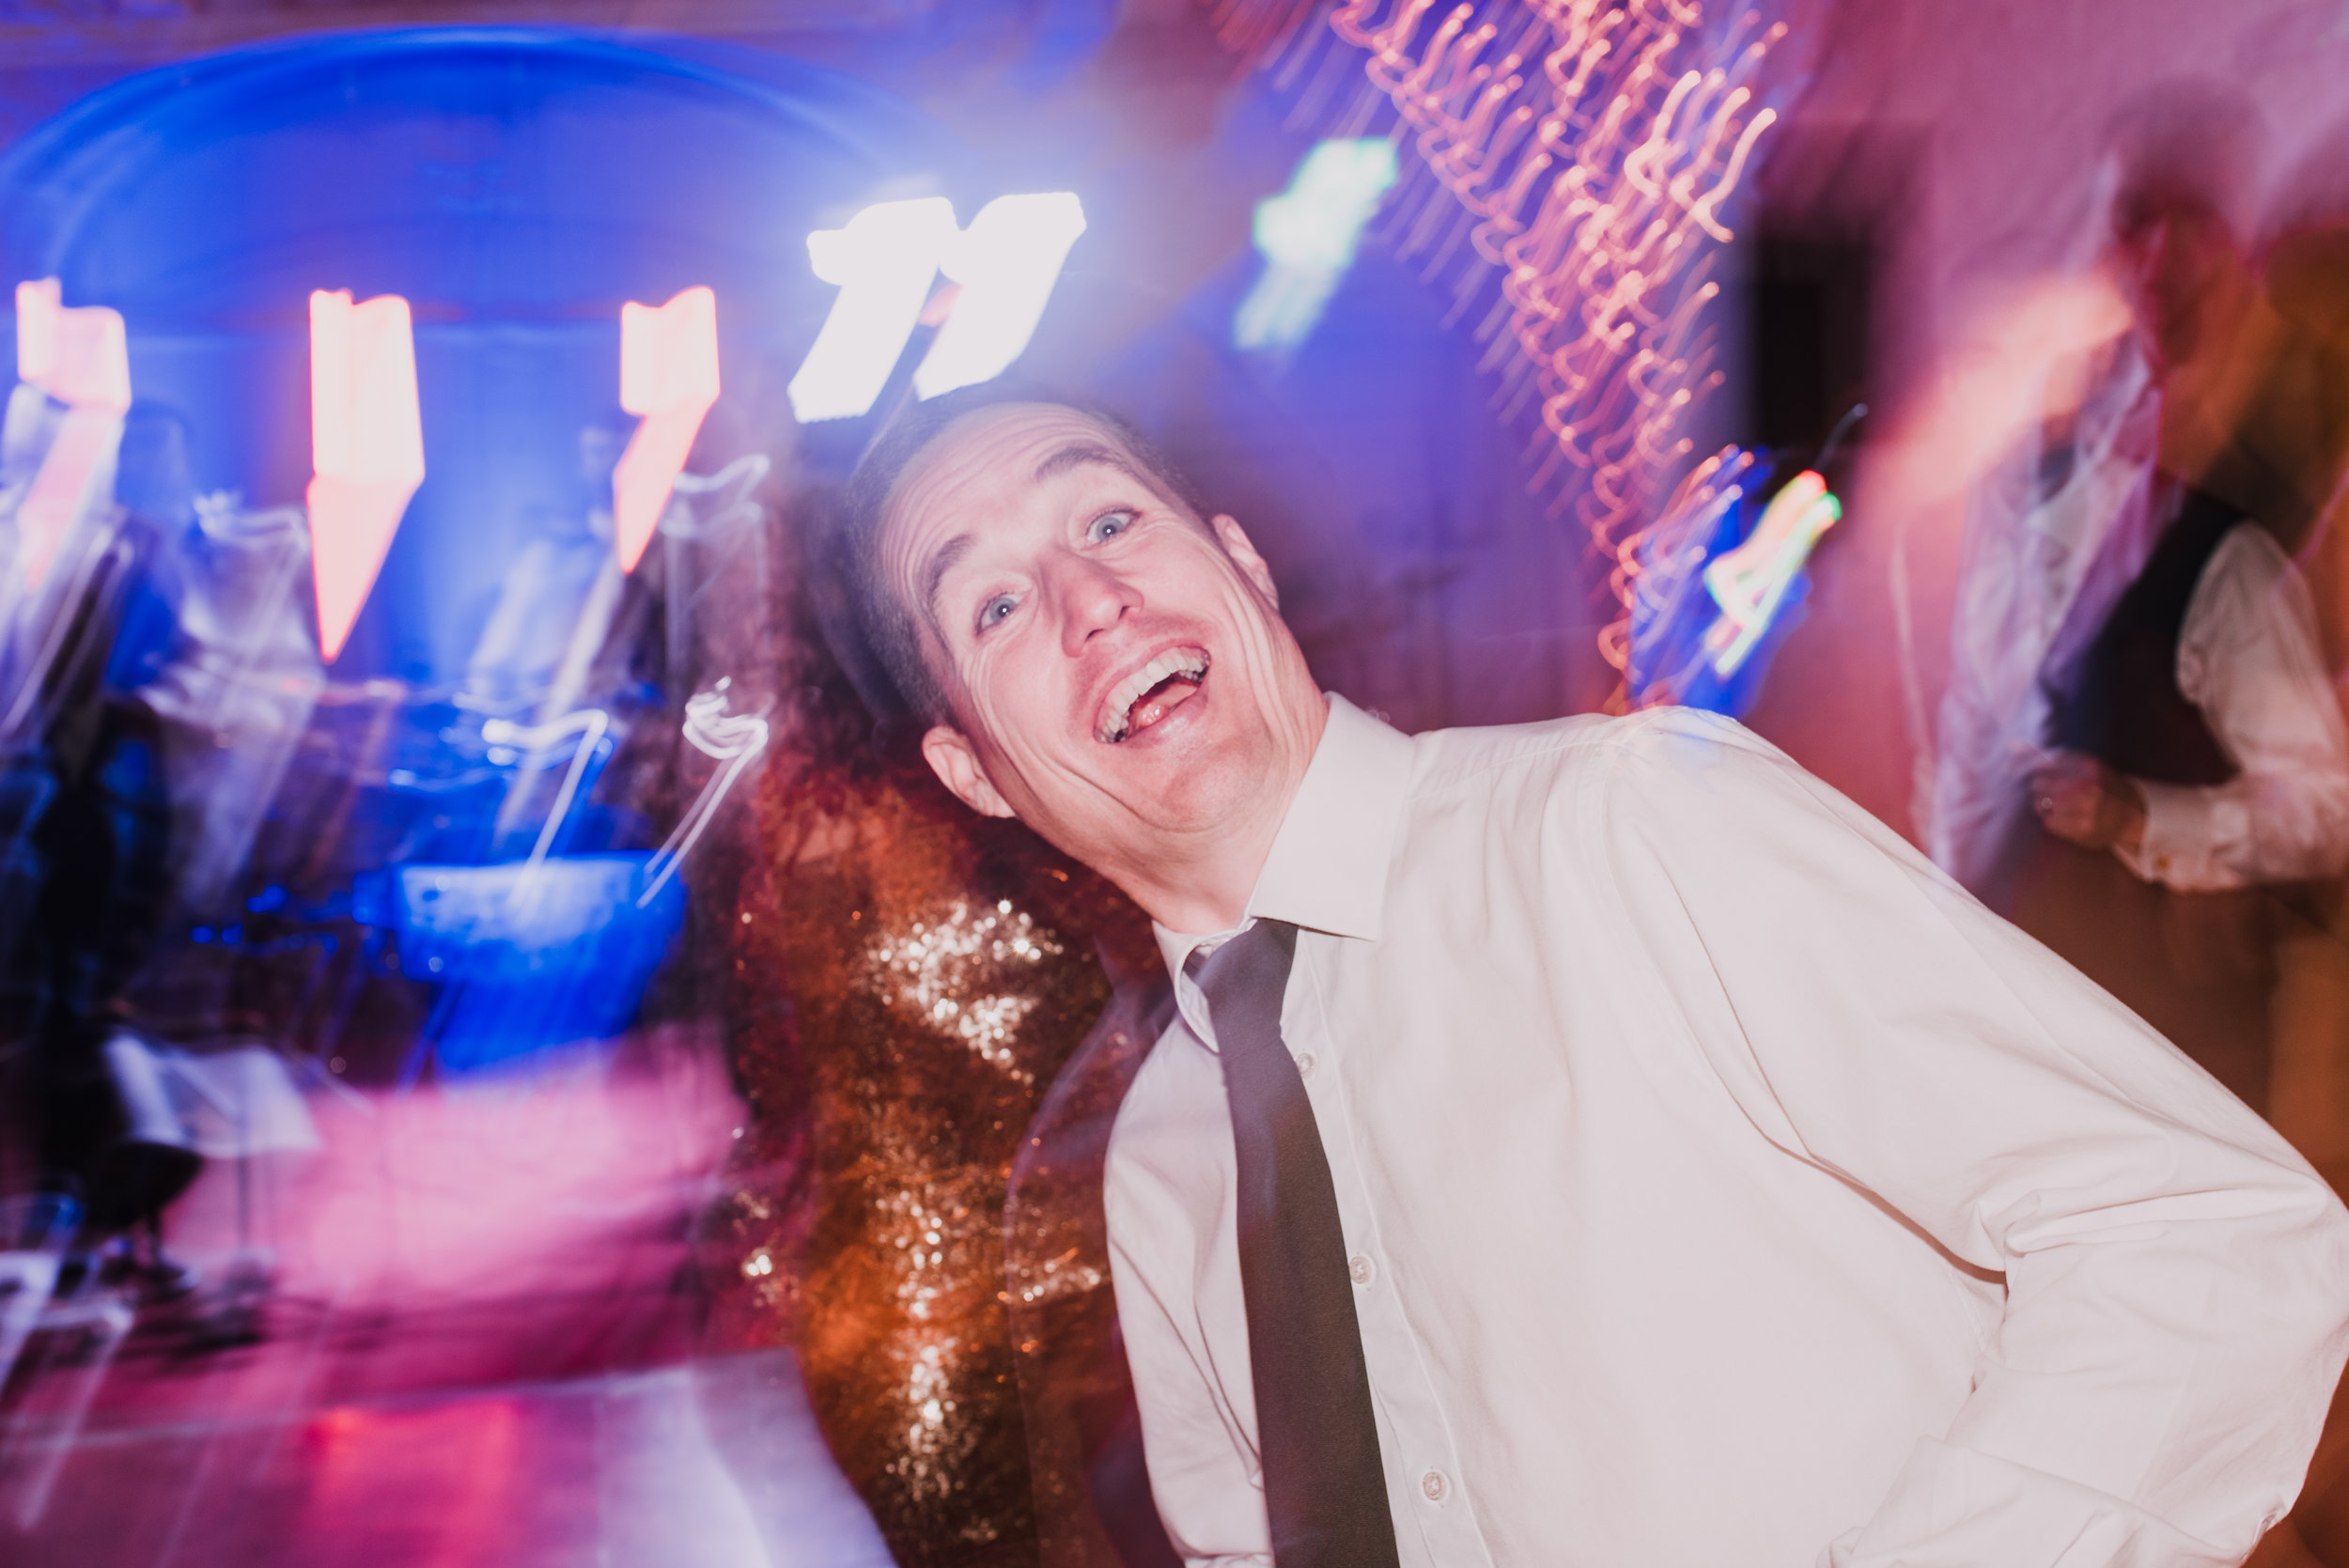 larchfield estate wedding, wedding venues northern ireland, barn wedding venues northern ireland, wedding photos larchfield estate, shane todd wedding, irish wedding, first dance (8).jpg